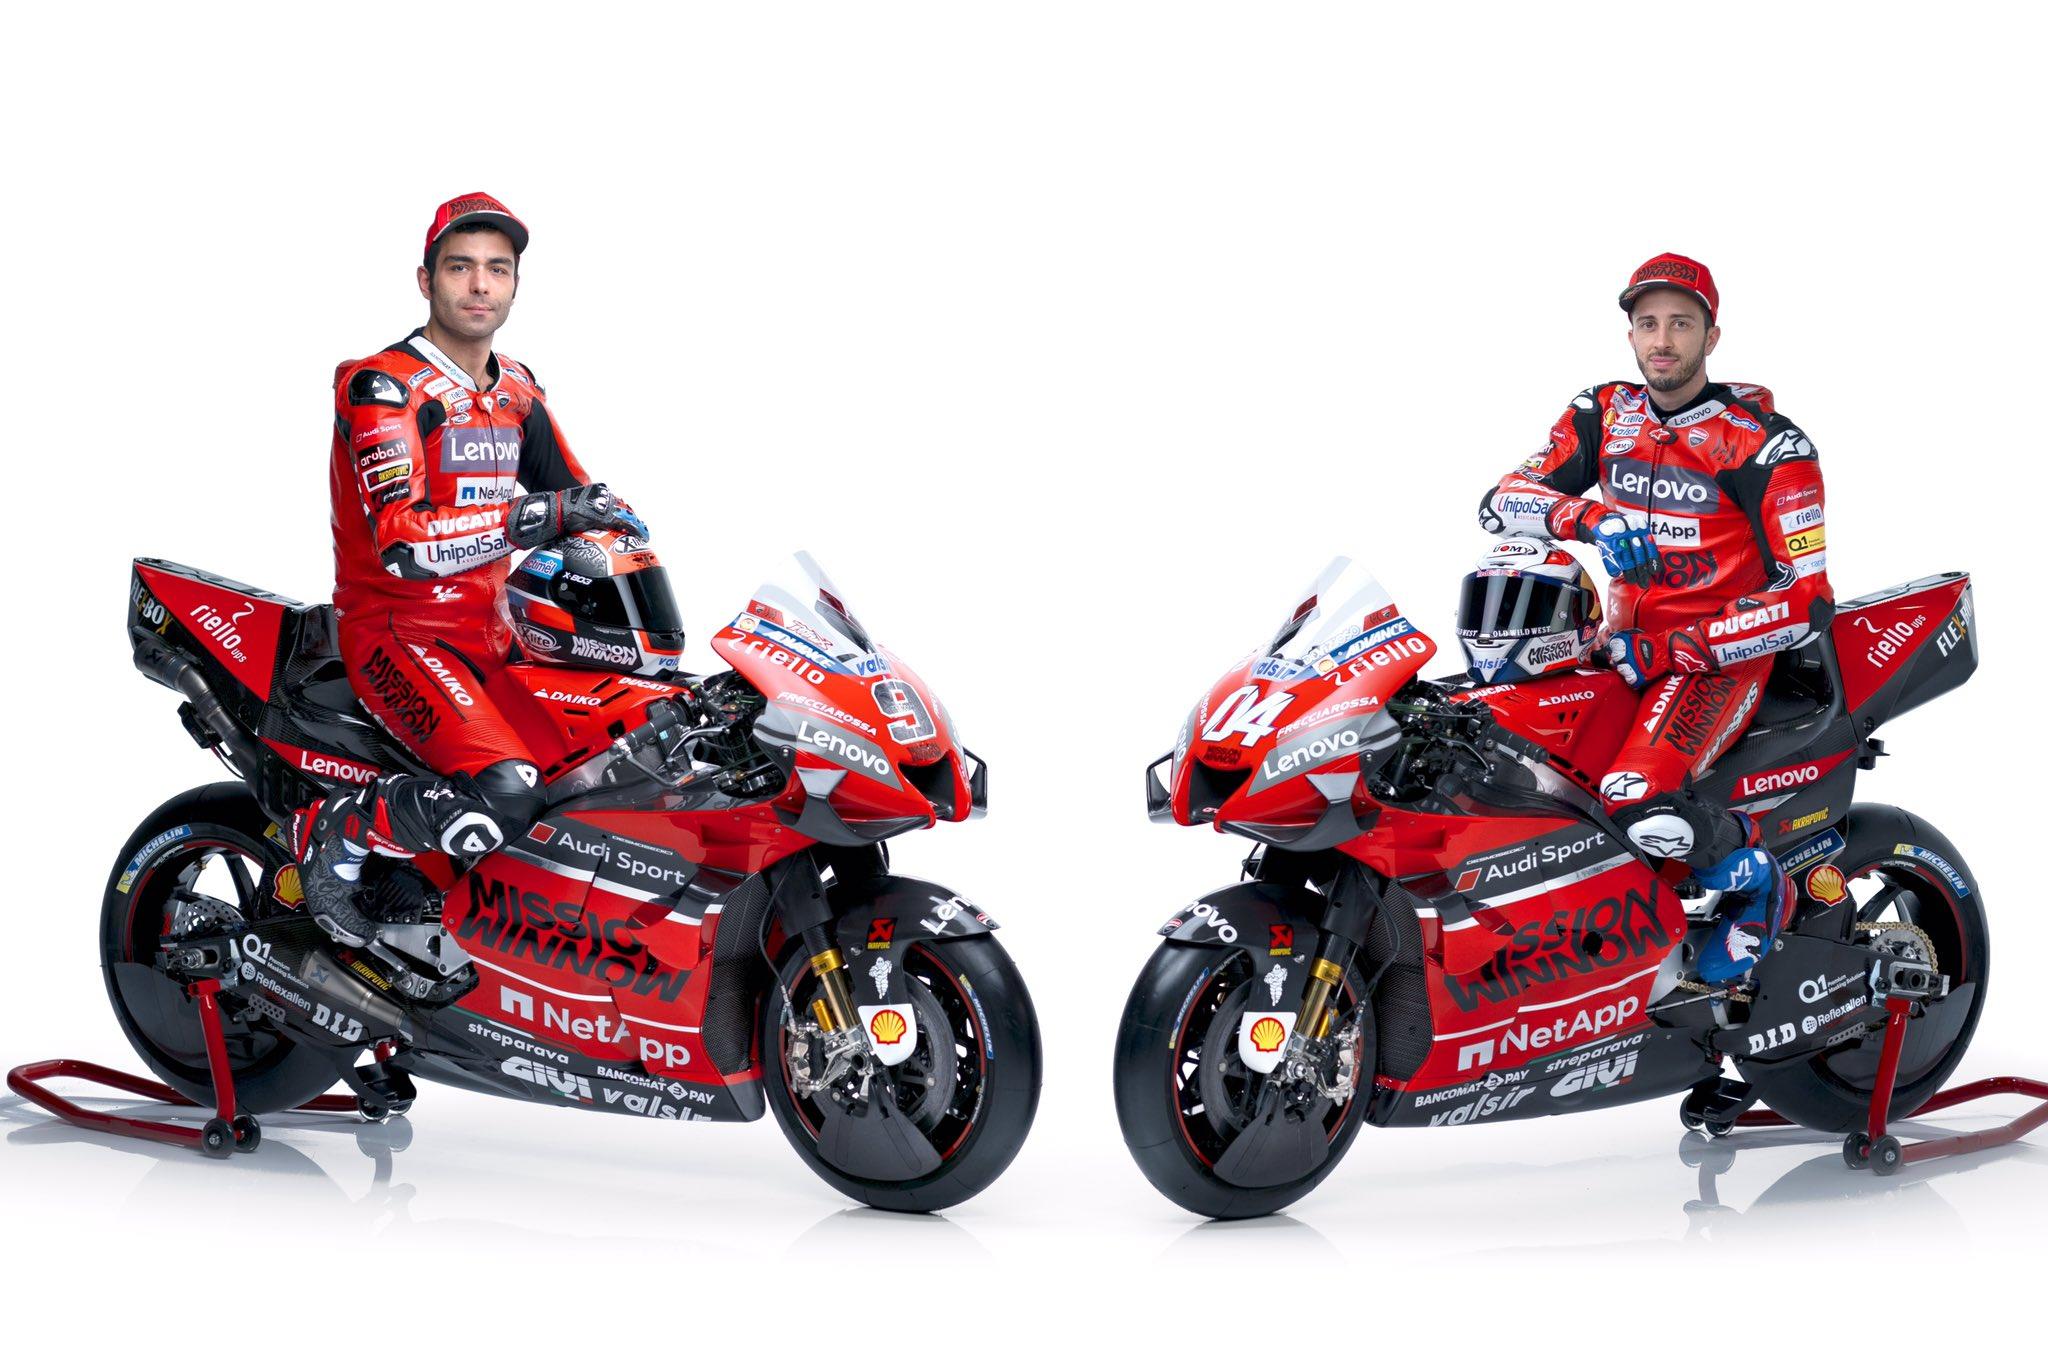 Pilotos del equipo Ducati